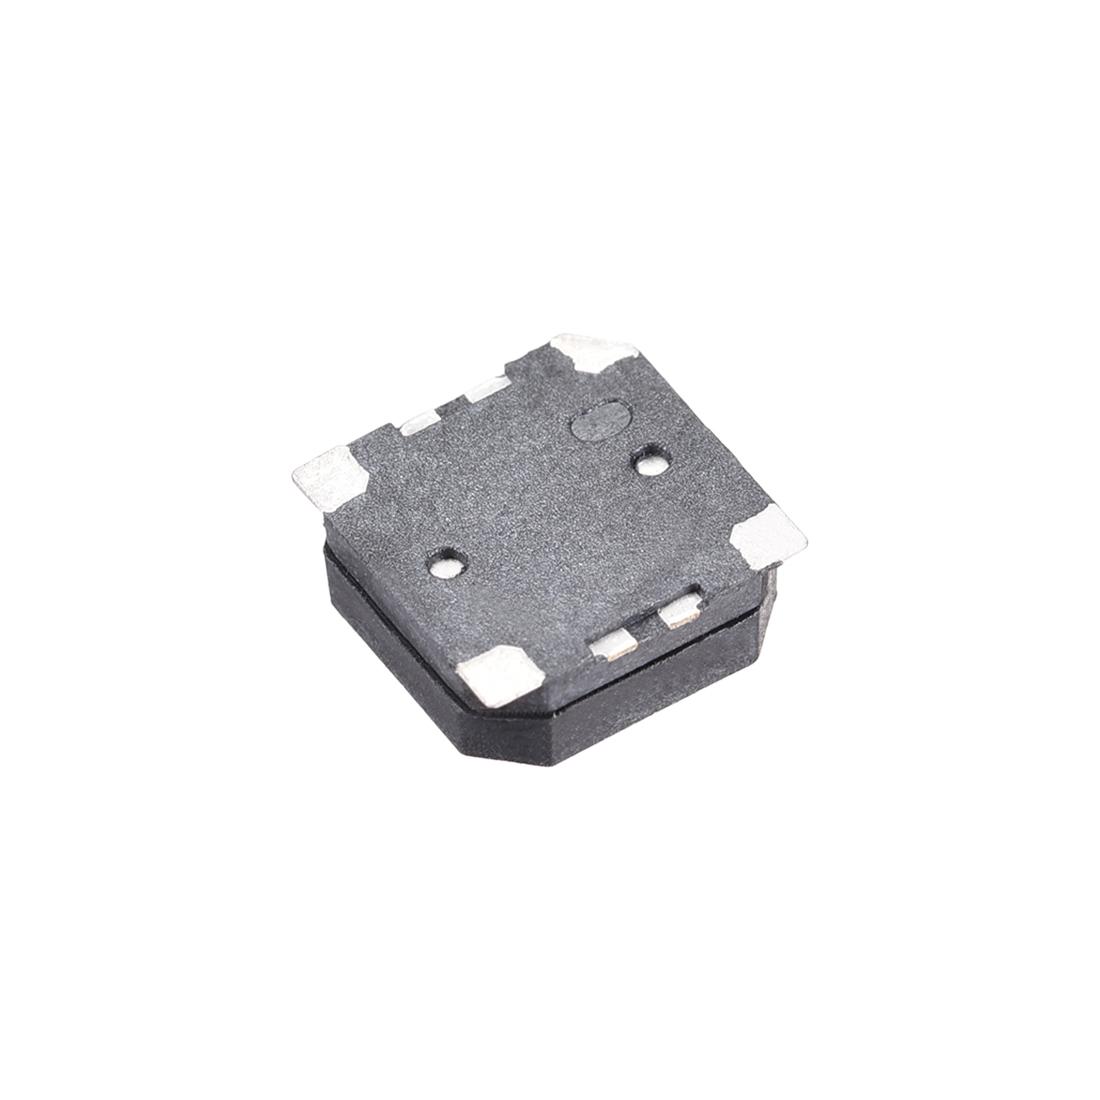 80dB 3V Passive Electronic Buzzer Electromagnetic Beep Tone Piezo Alarm Ringer